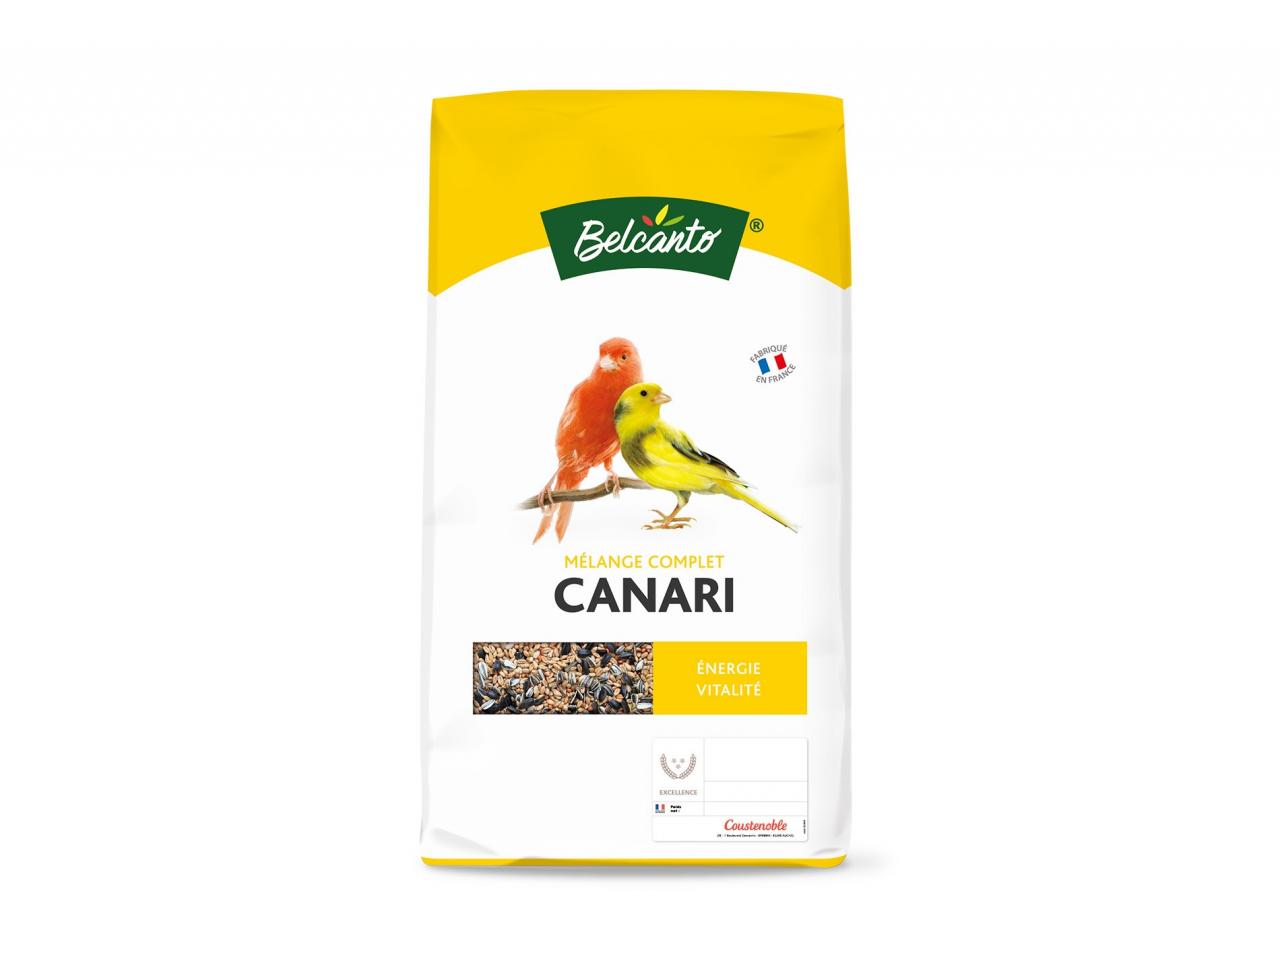 98575-melange-complet-canari-belcanto-1